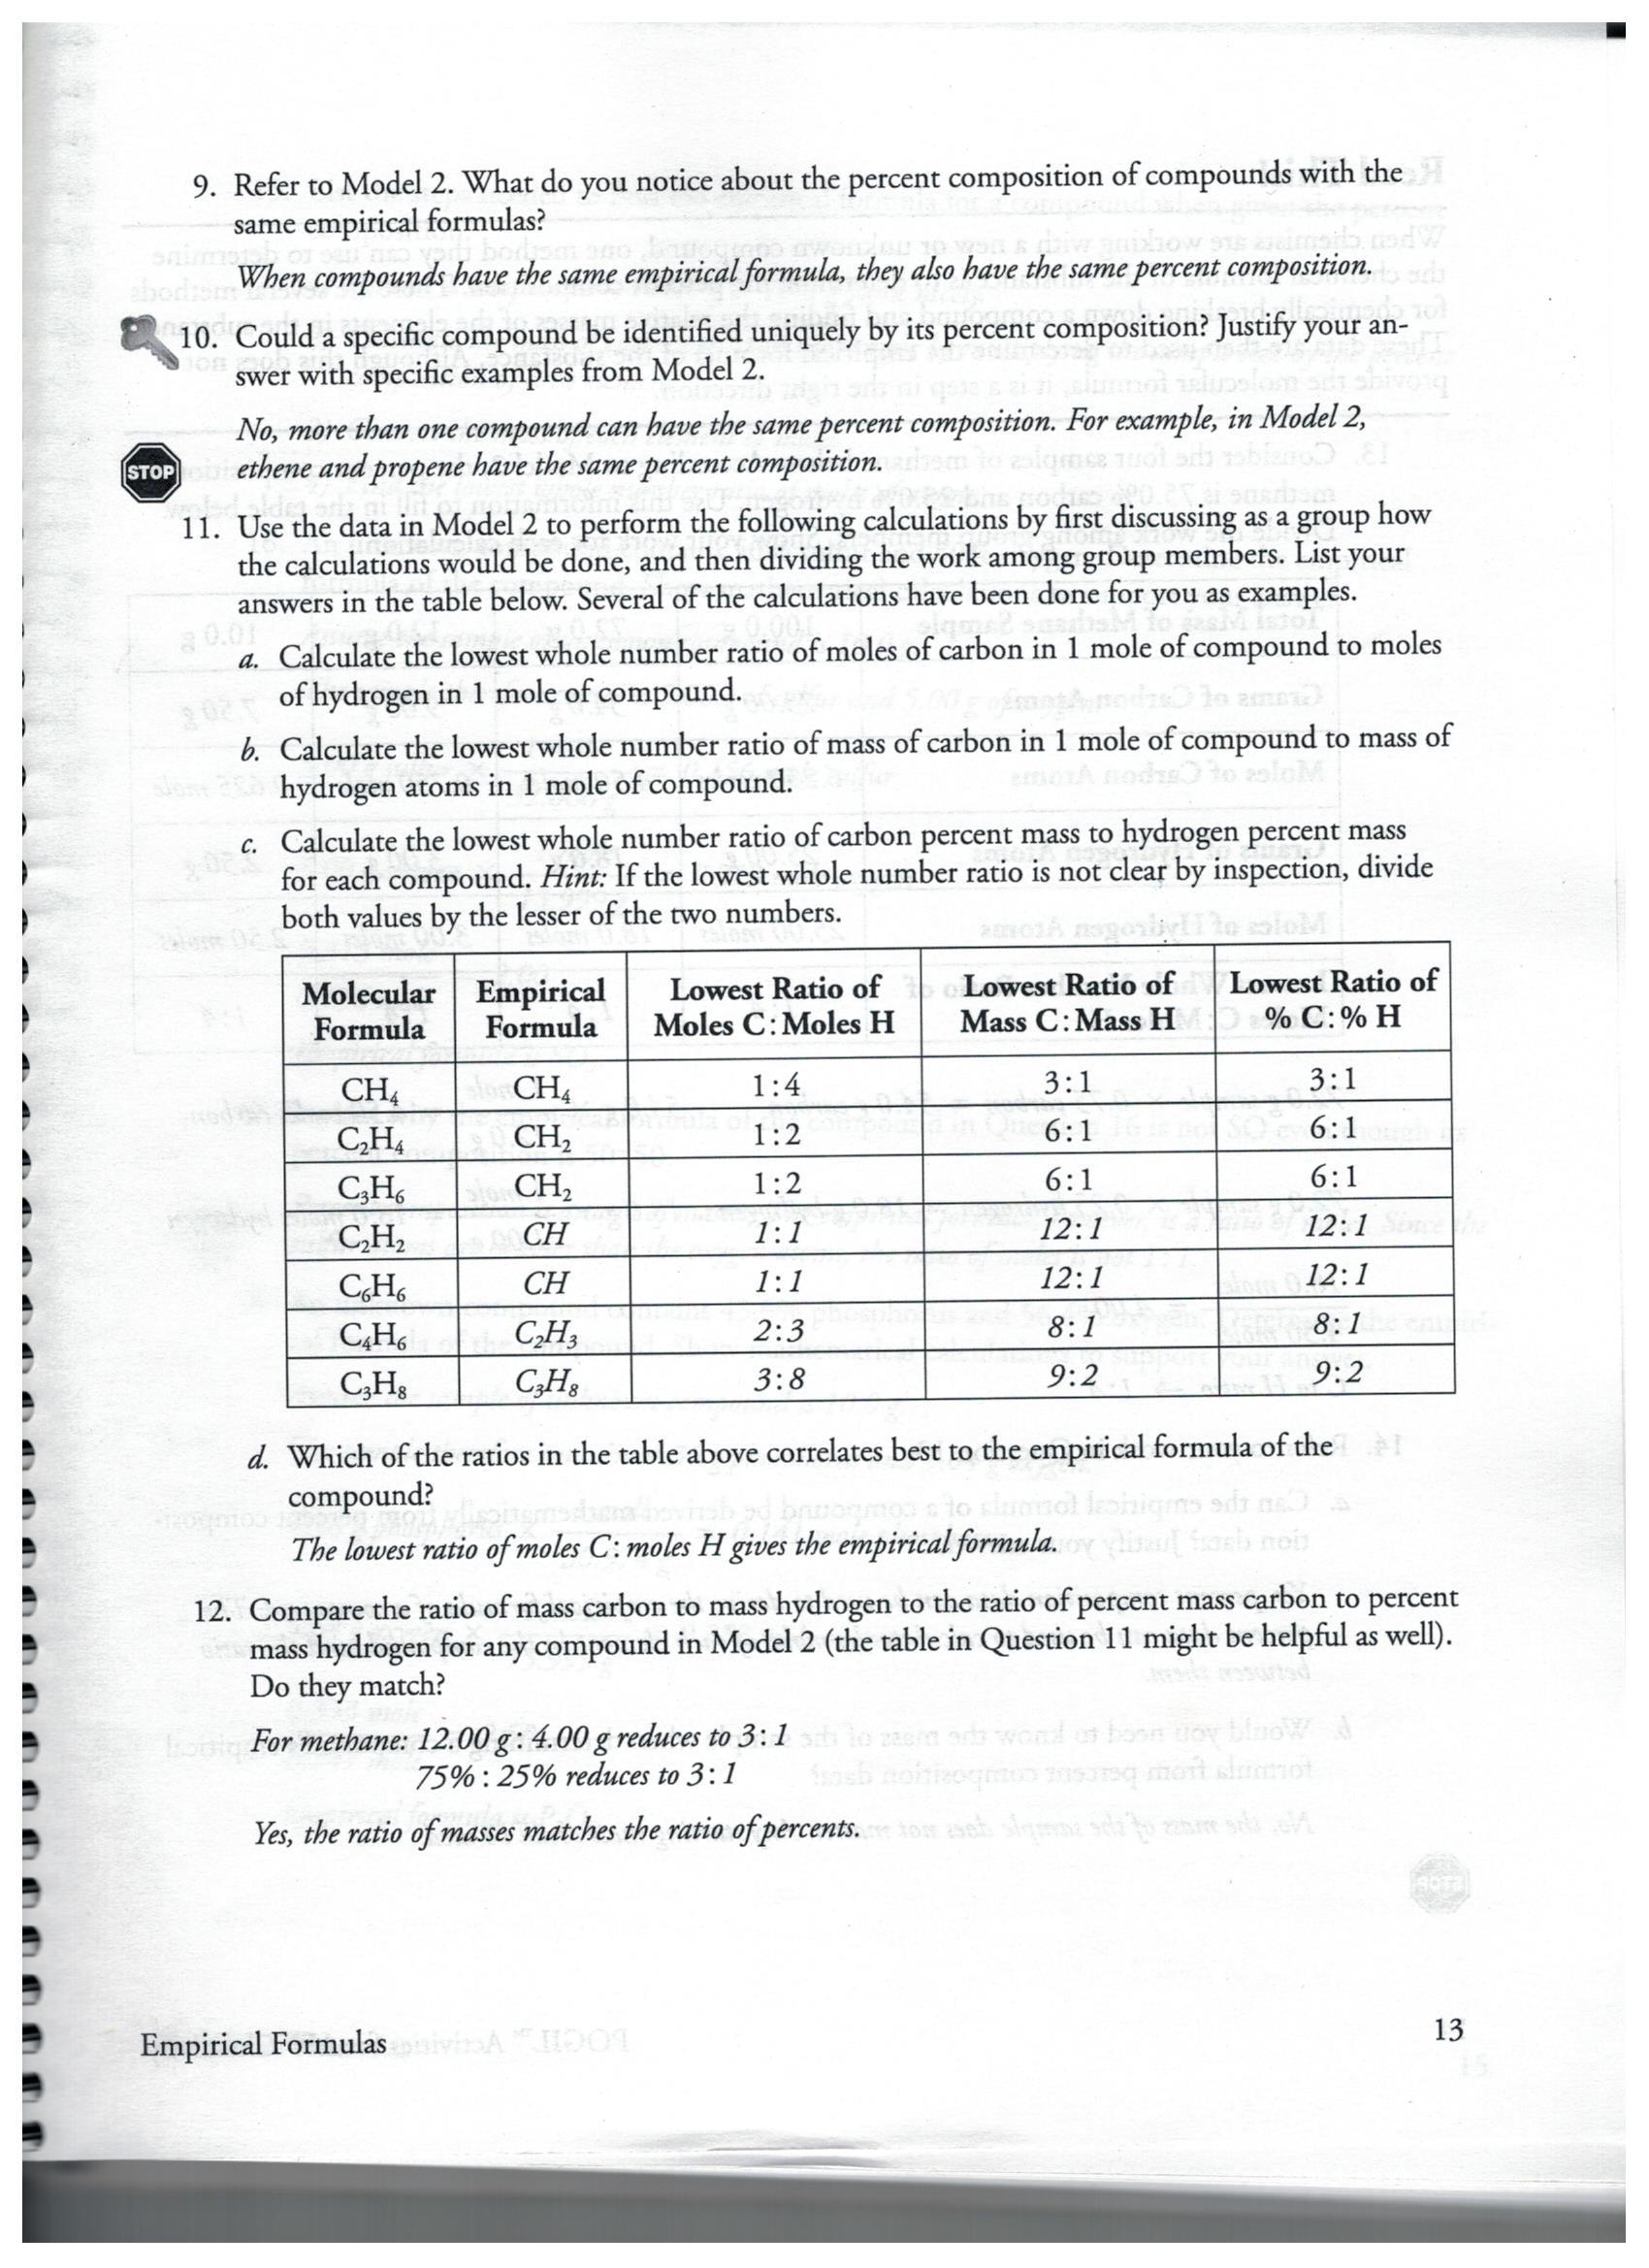 Empirical Formula And Molecular Formula Worksheet Pogil